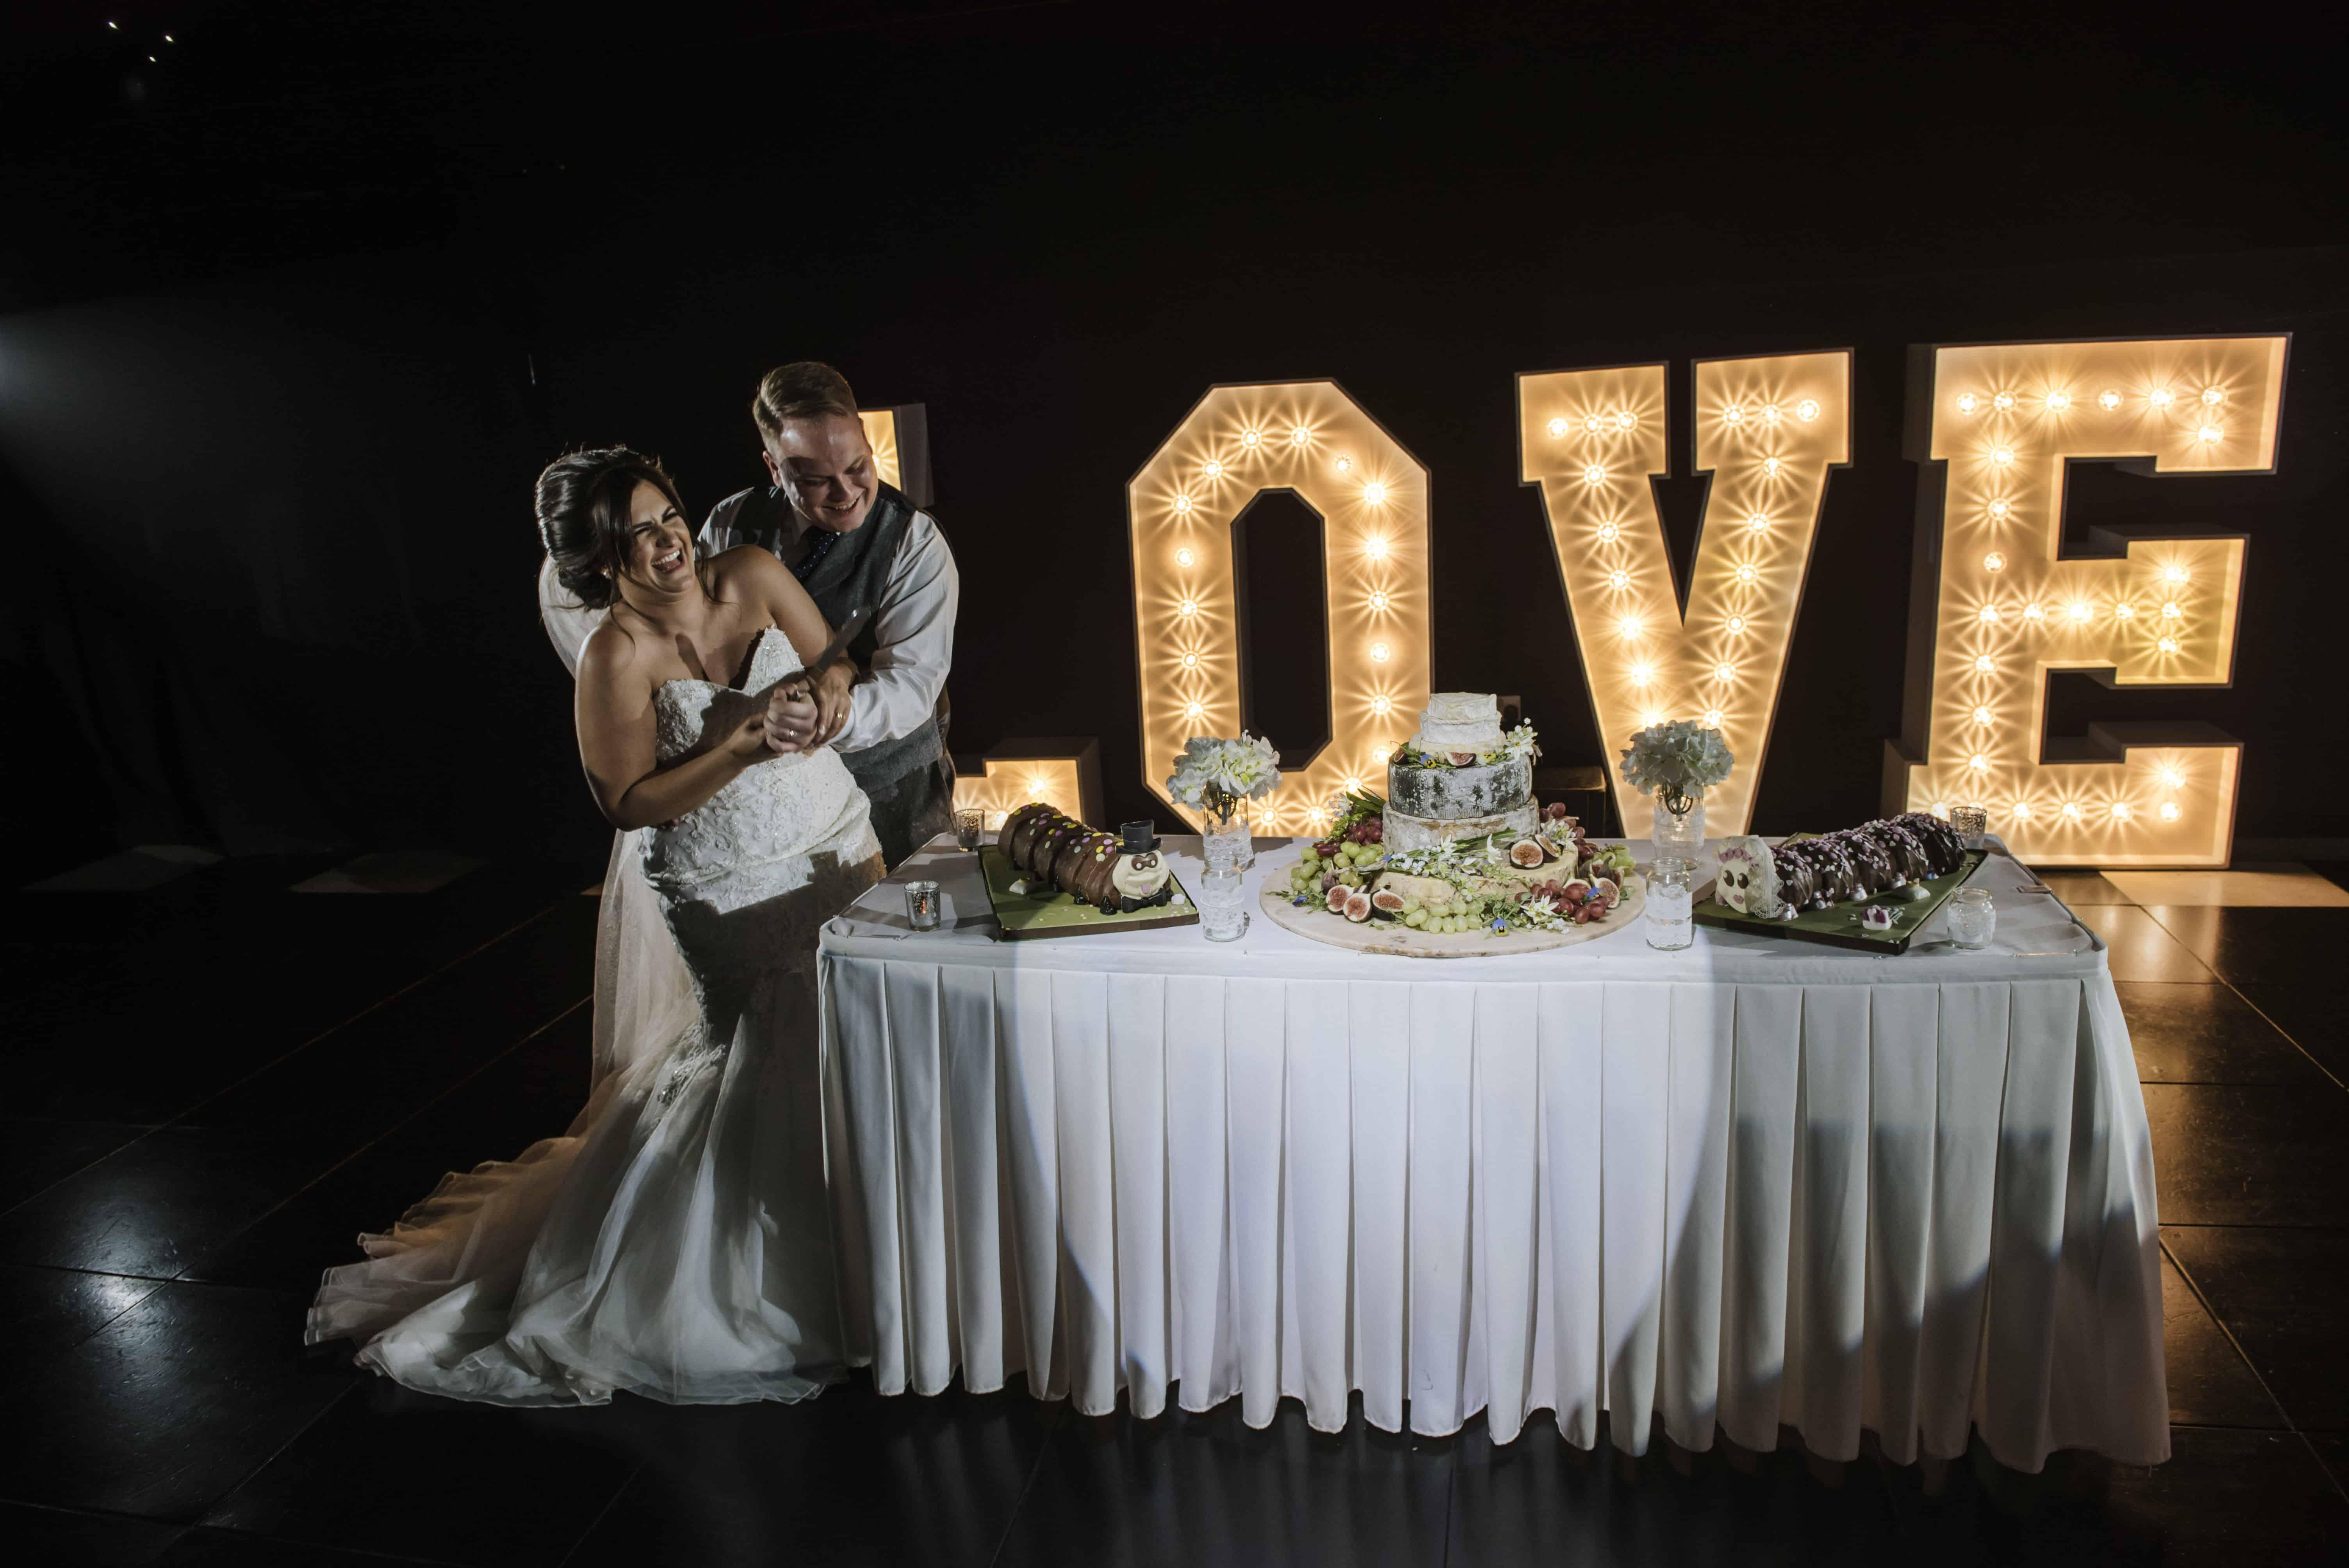 Bride & Groom cutting wedding cake Oldwalls Wedding Photographer